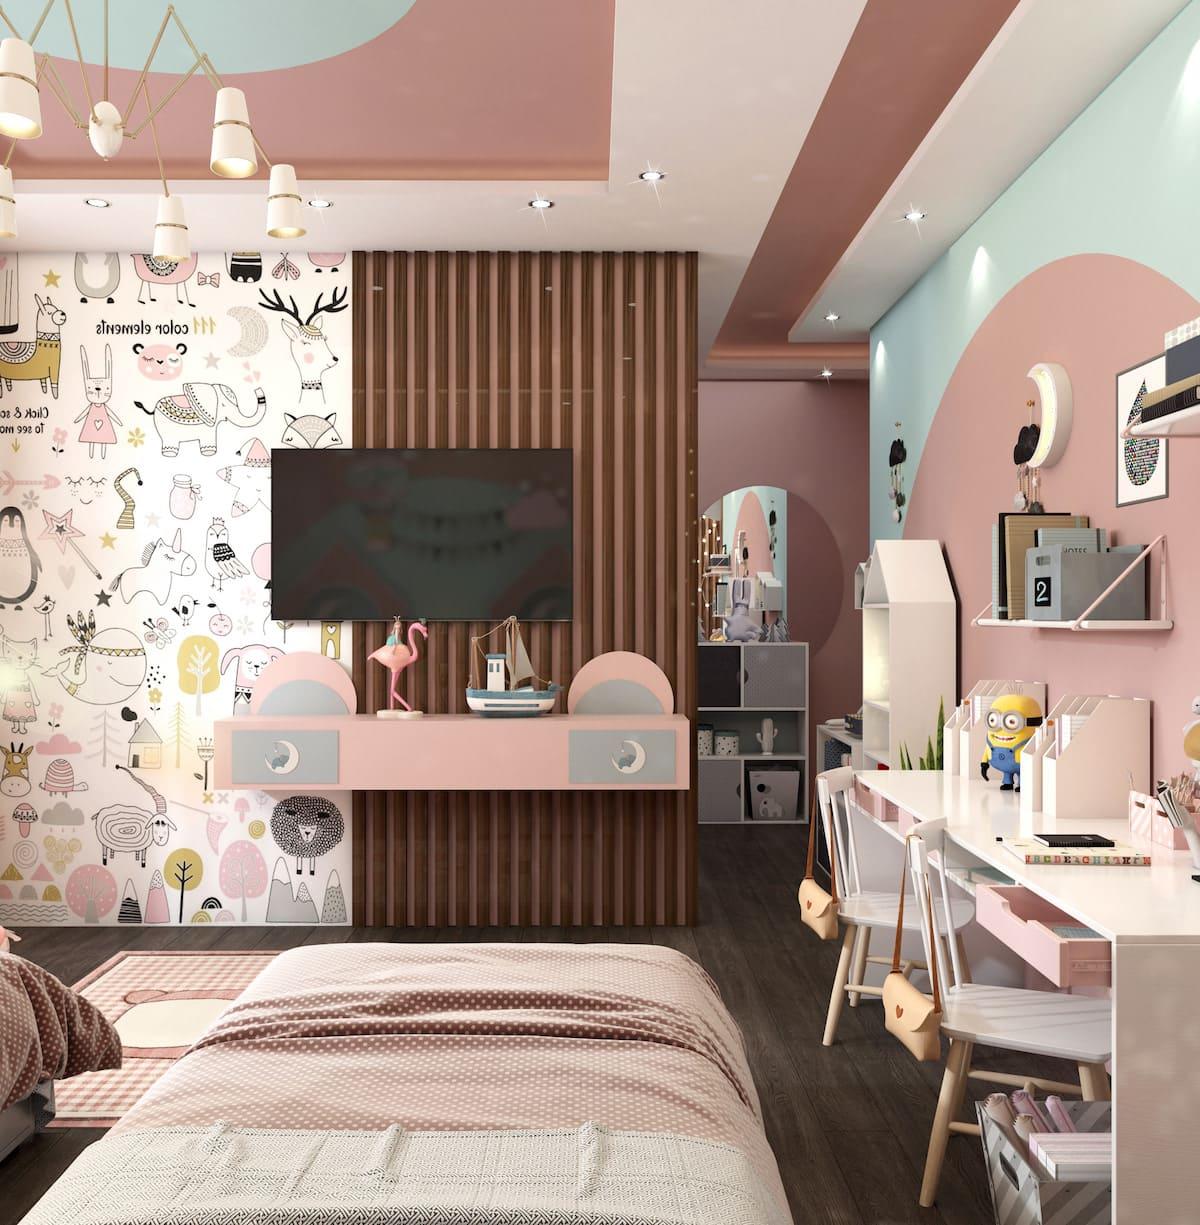 интерьер детской комнаты фото 90